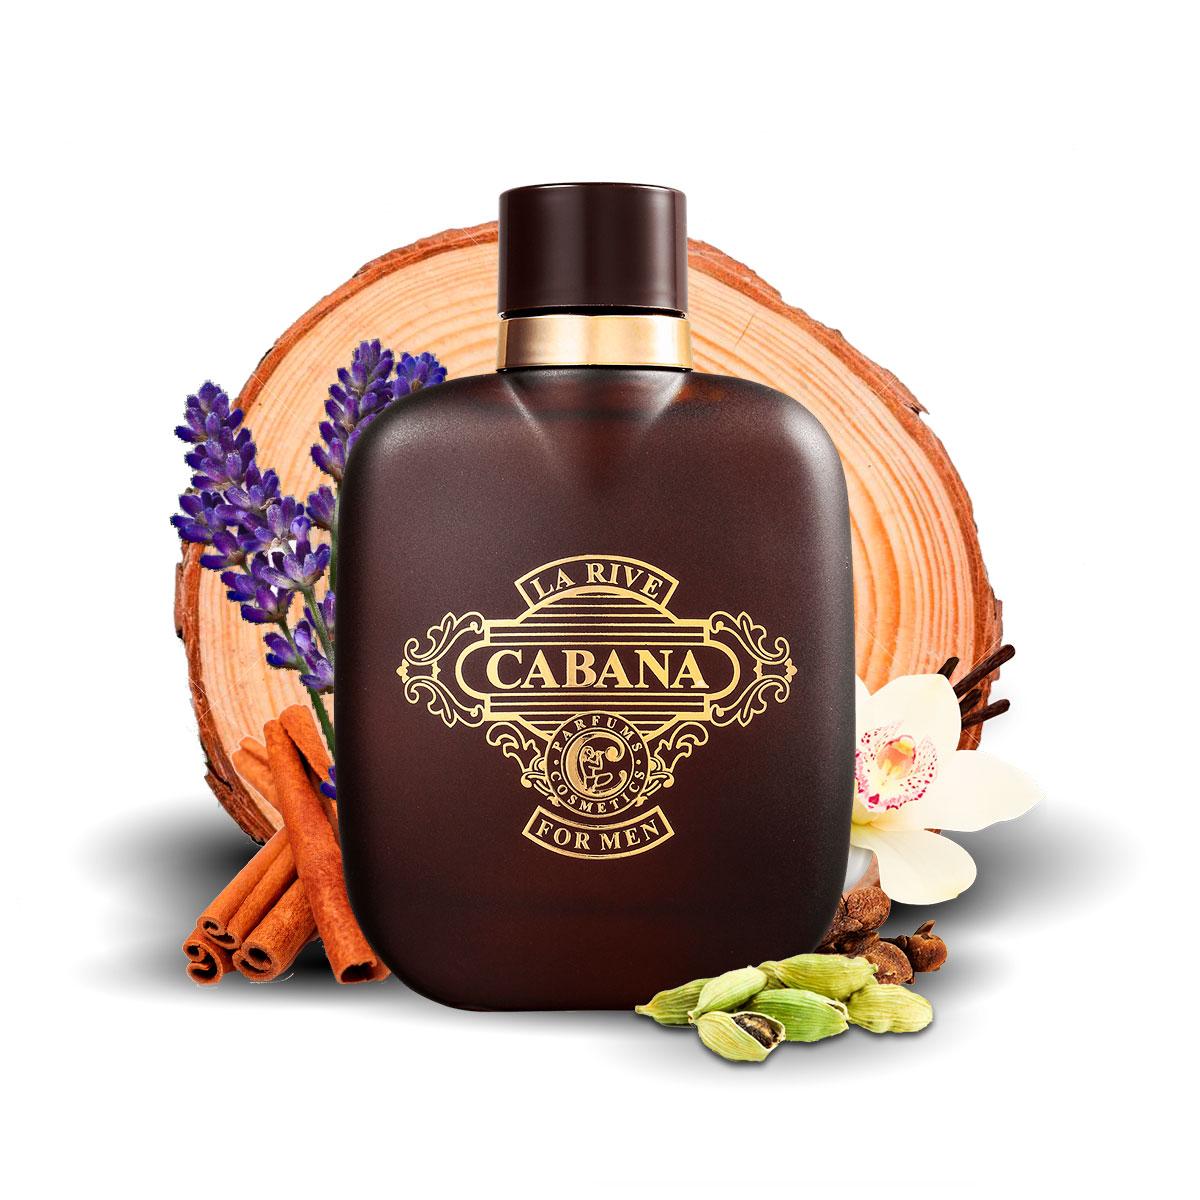 Kit 2 Perfumes Importados Cabana e Eternal Kiss La Rive